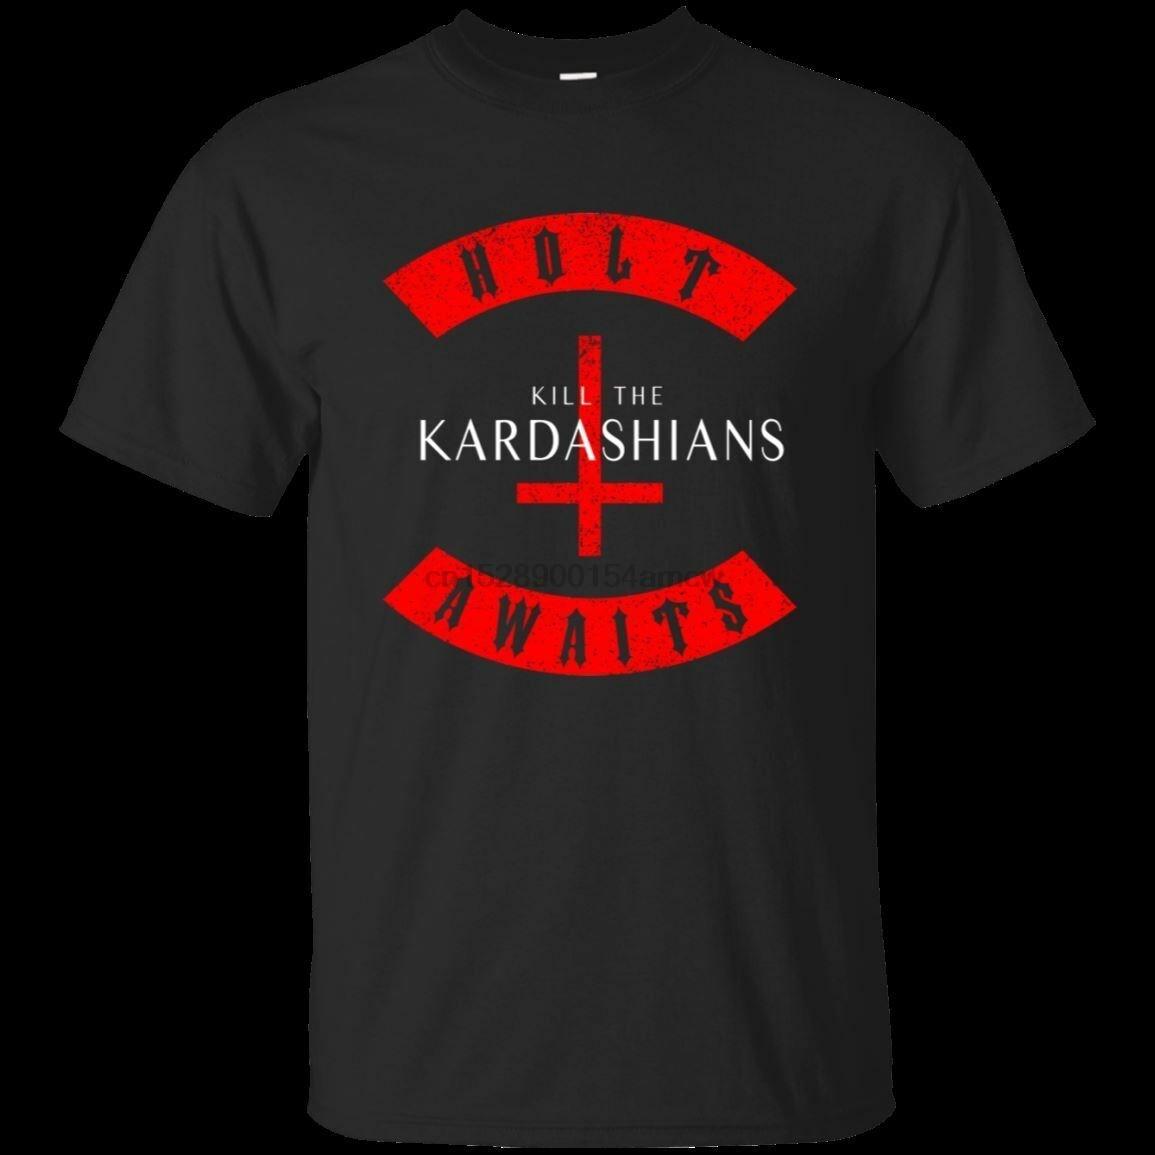 "Slayer Gary Holt /""Kill the Kardashians/"" t shirt Black 100/% cotton Men/'s tee"